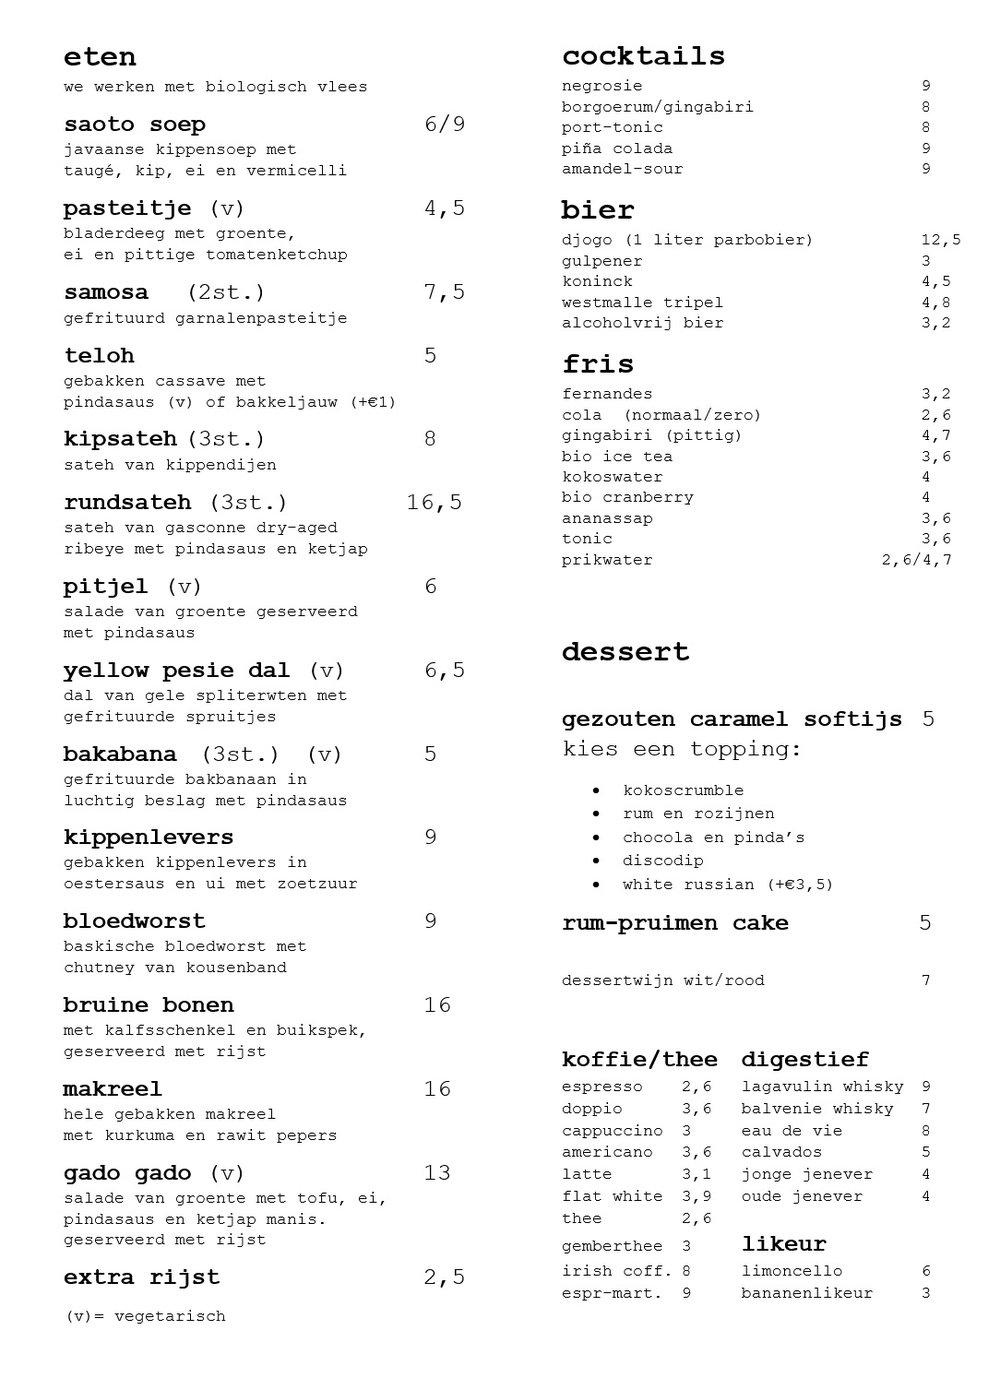 menu website januari 2019.jpg